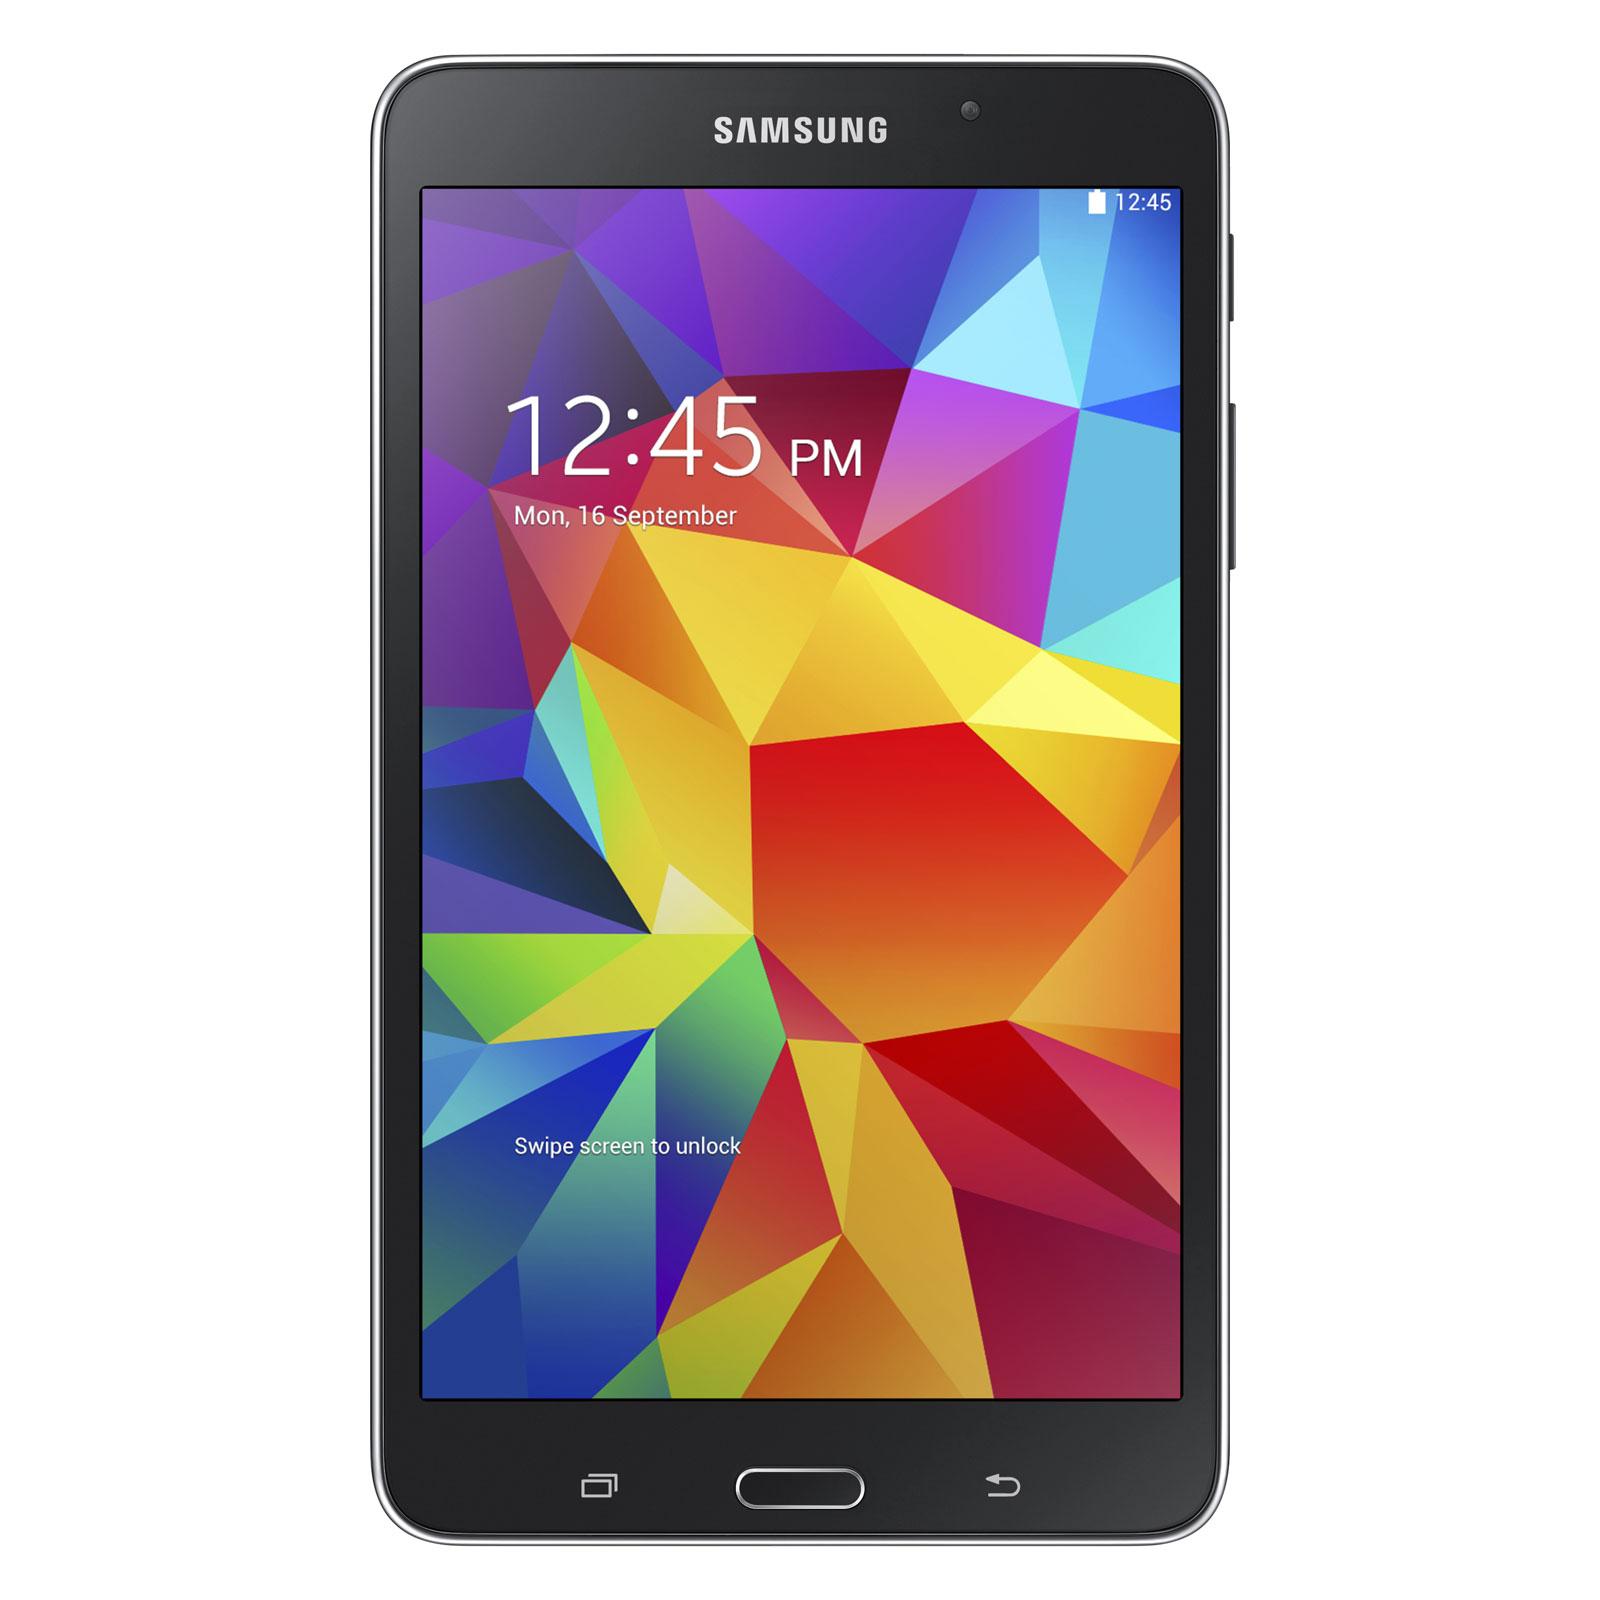 "Tablette tactile Samsung Galaxy Tab 4 7"" SM-T230 8 Go Noir Tablette Internet - ARM Cortex-A7 Quad-Core 1.2 GHz 1.5 Go 8 Go 7"" LED Tactile Wi-Fi/Bluetooth/Webcam Android 4.4"